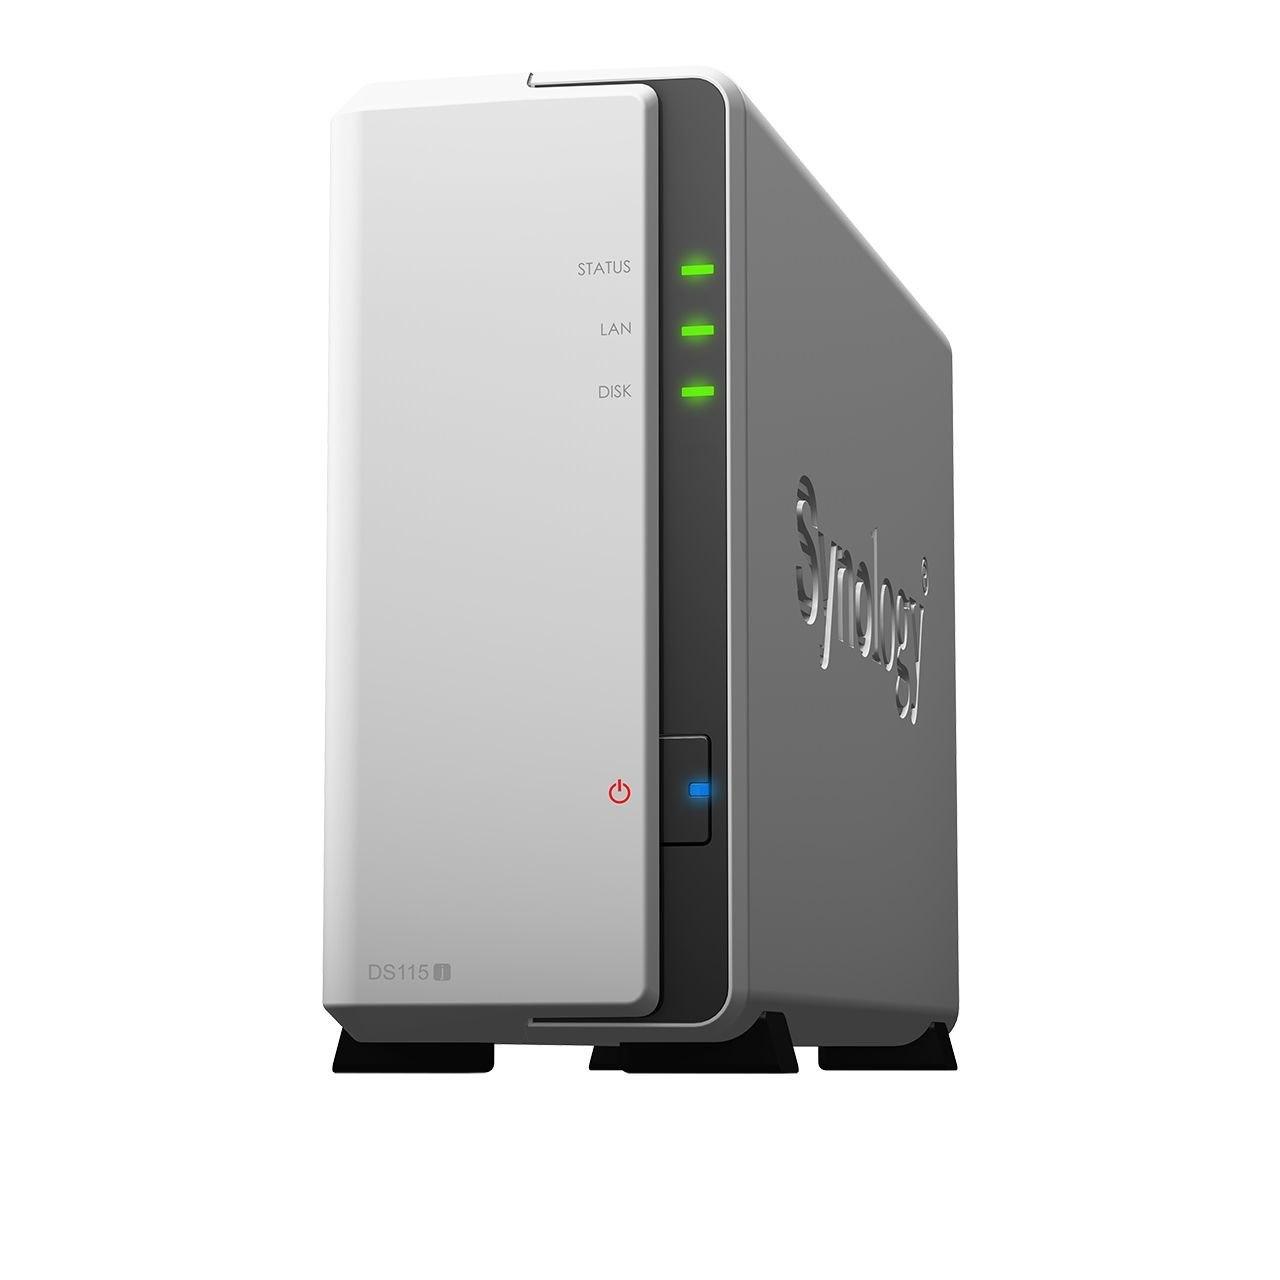 Synology DiskStation DS115j 1 x Total Bays NAS Storage System - External